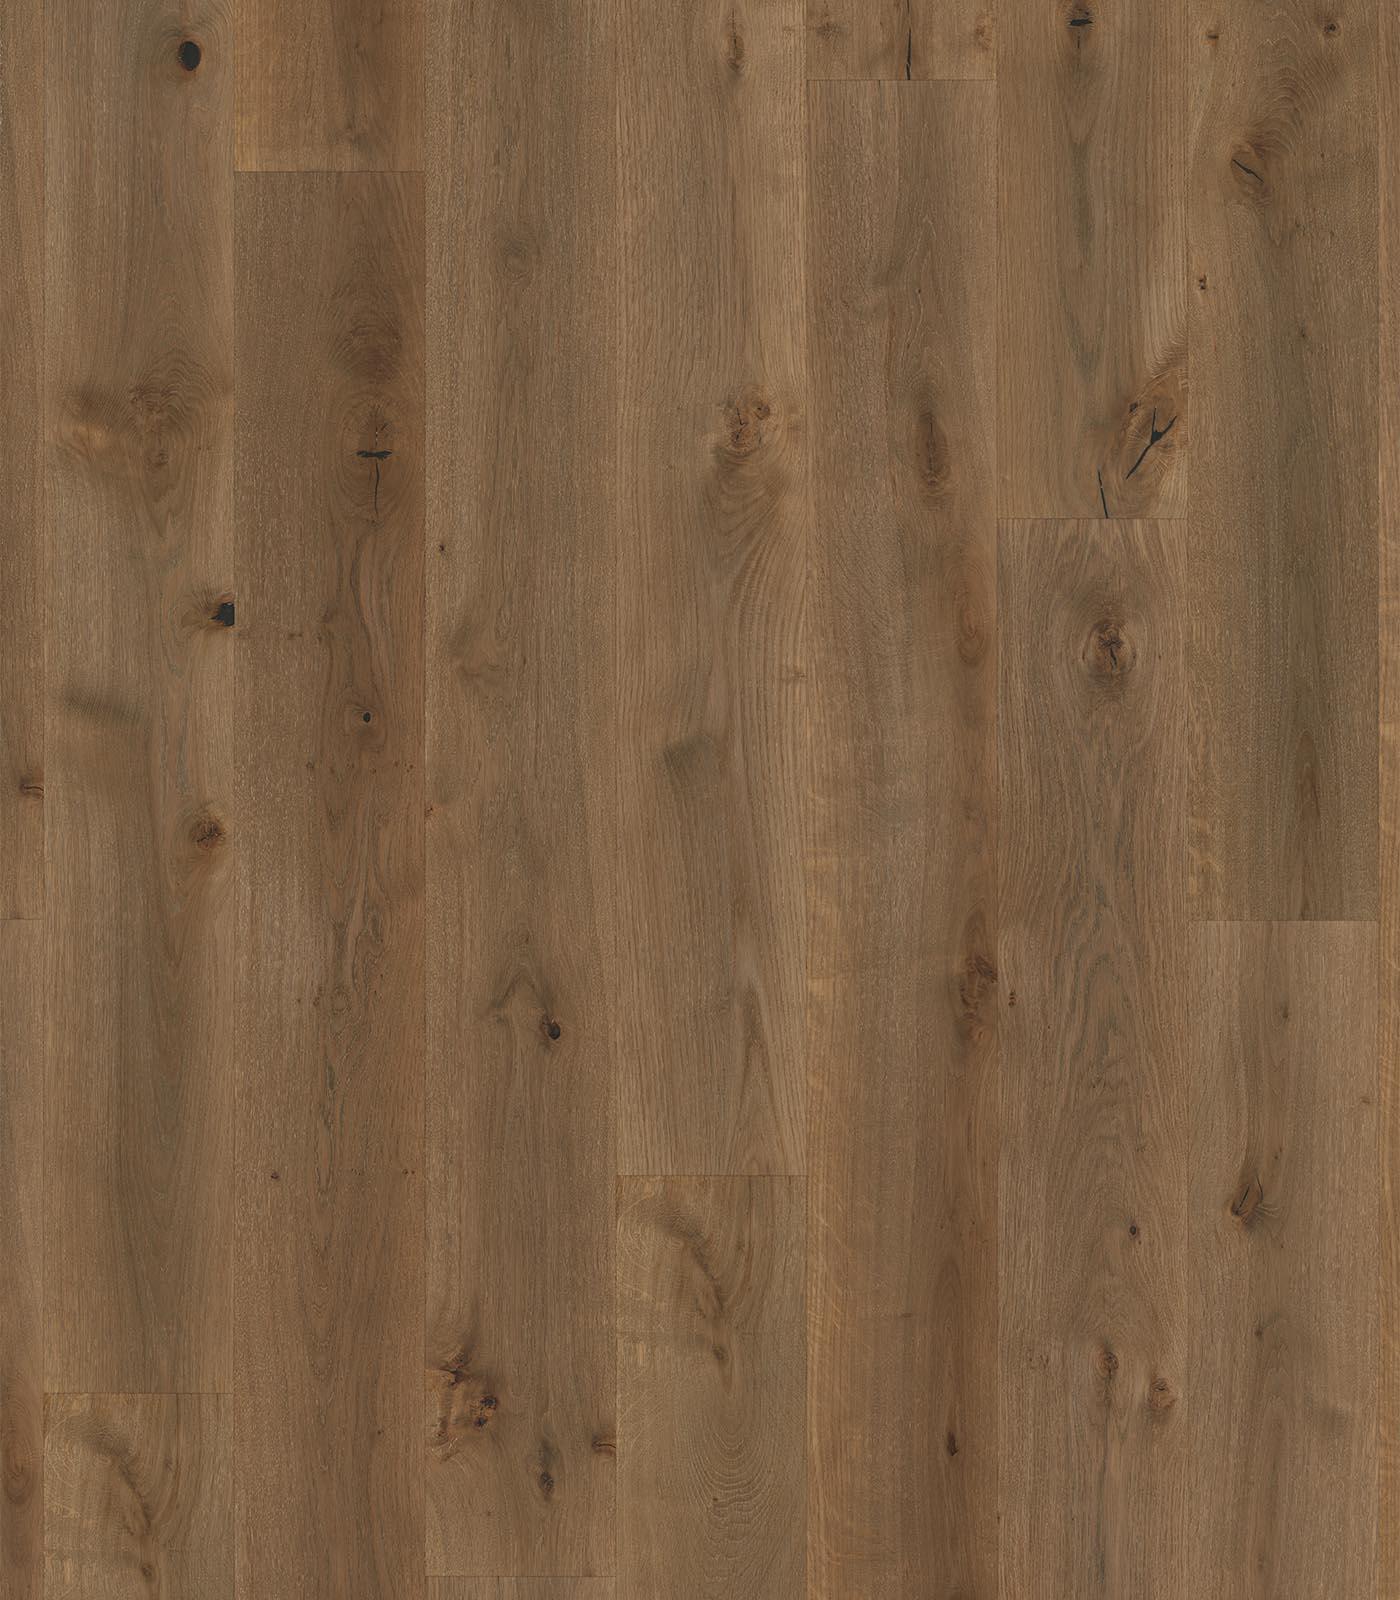 Curacao-Island Collection-European Oak floors-flat